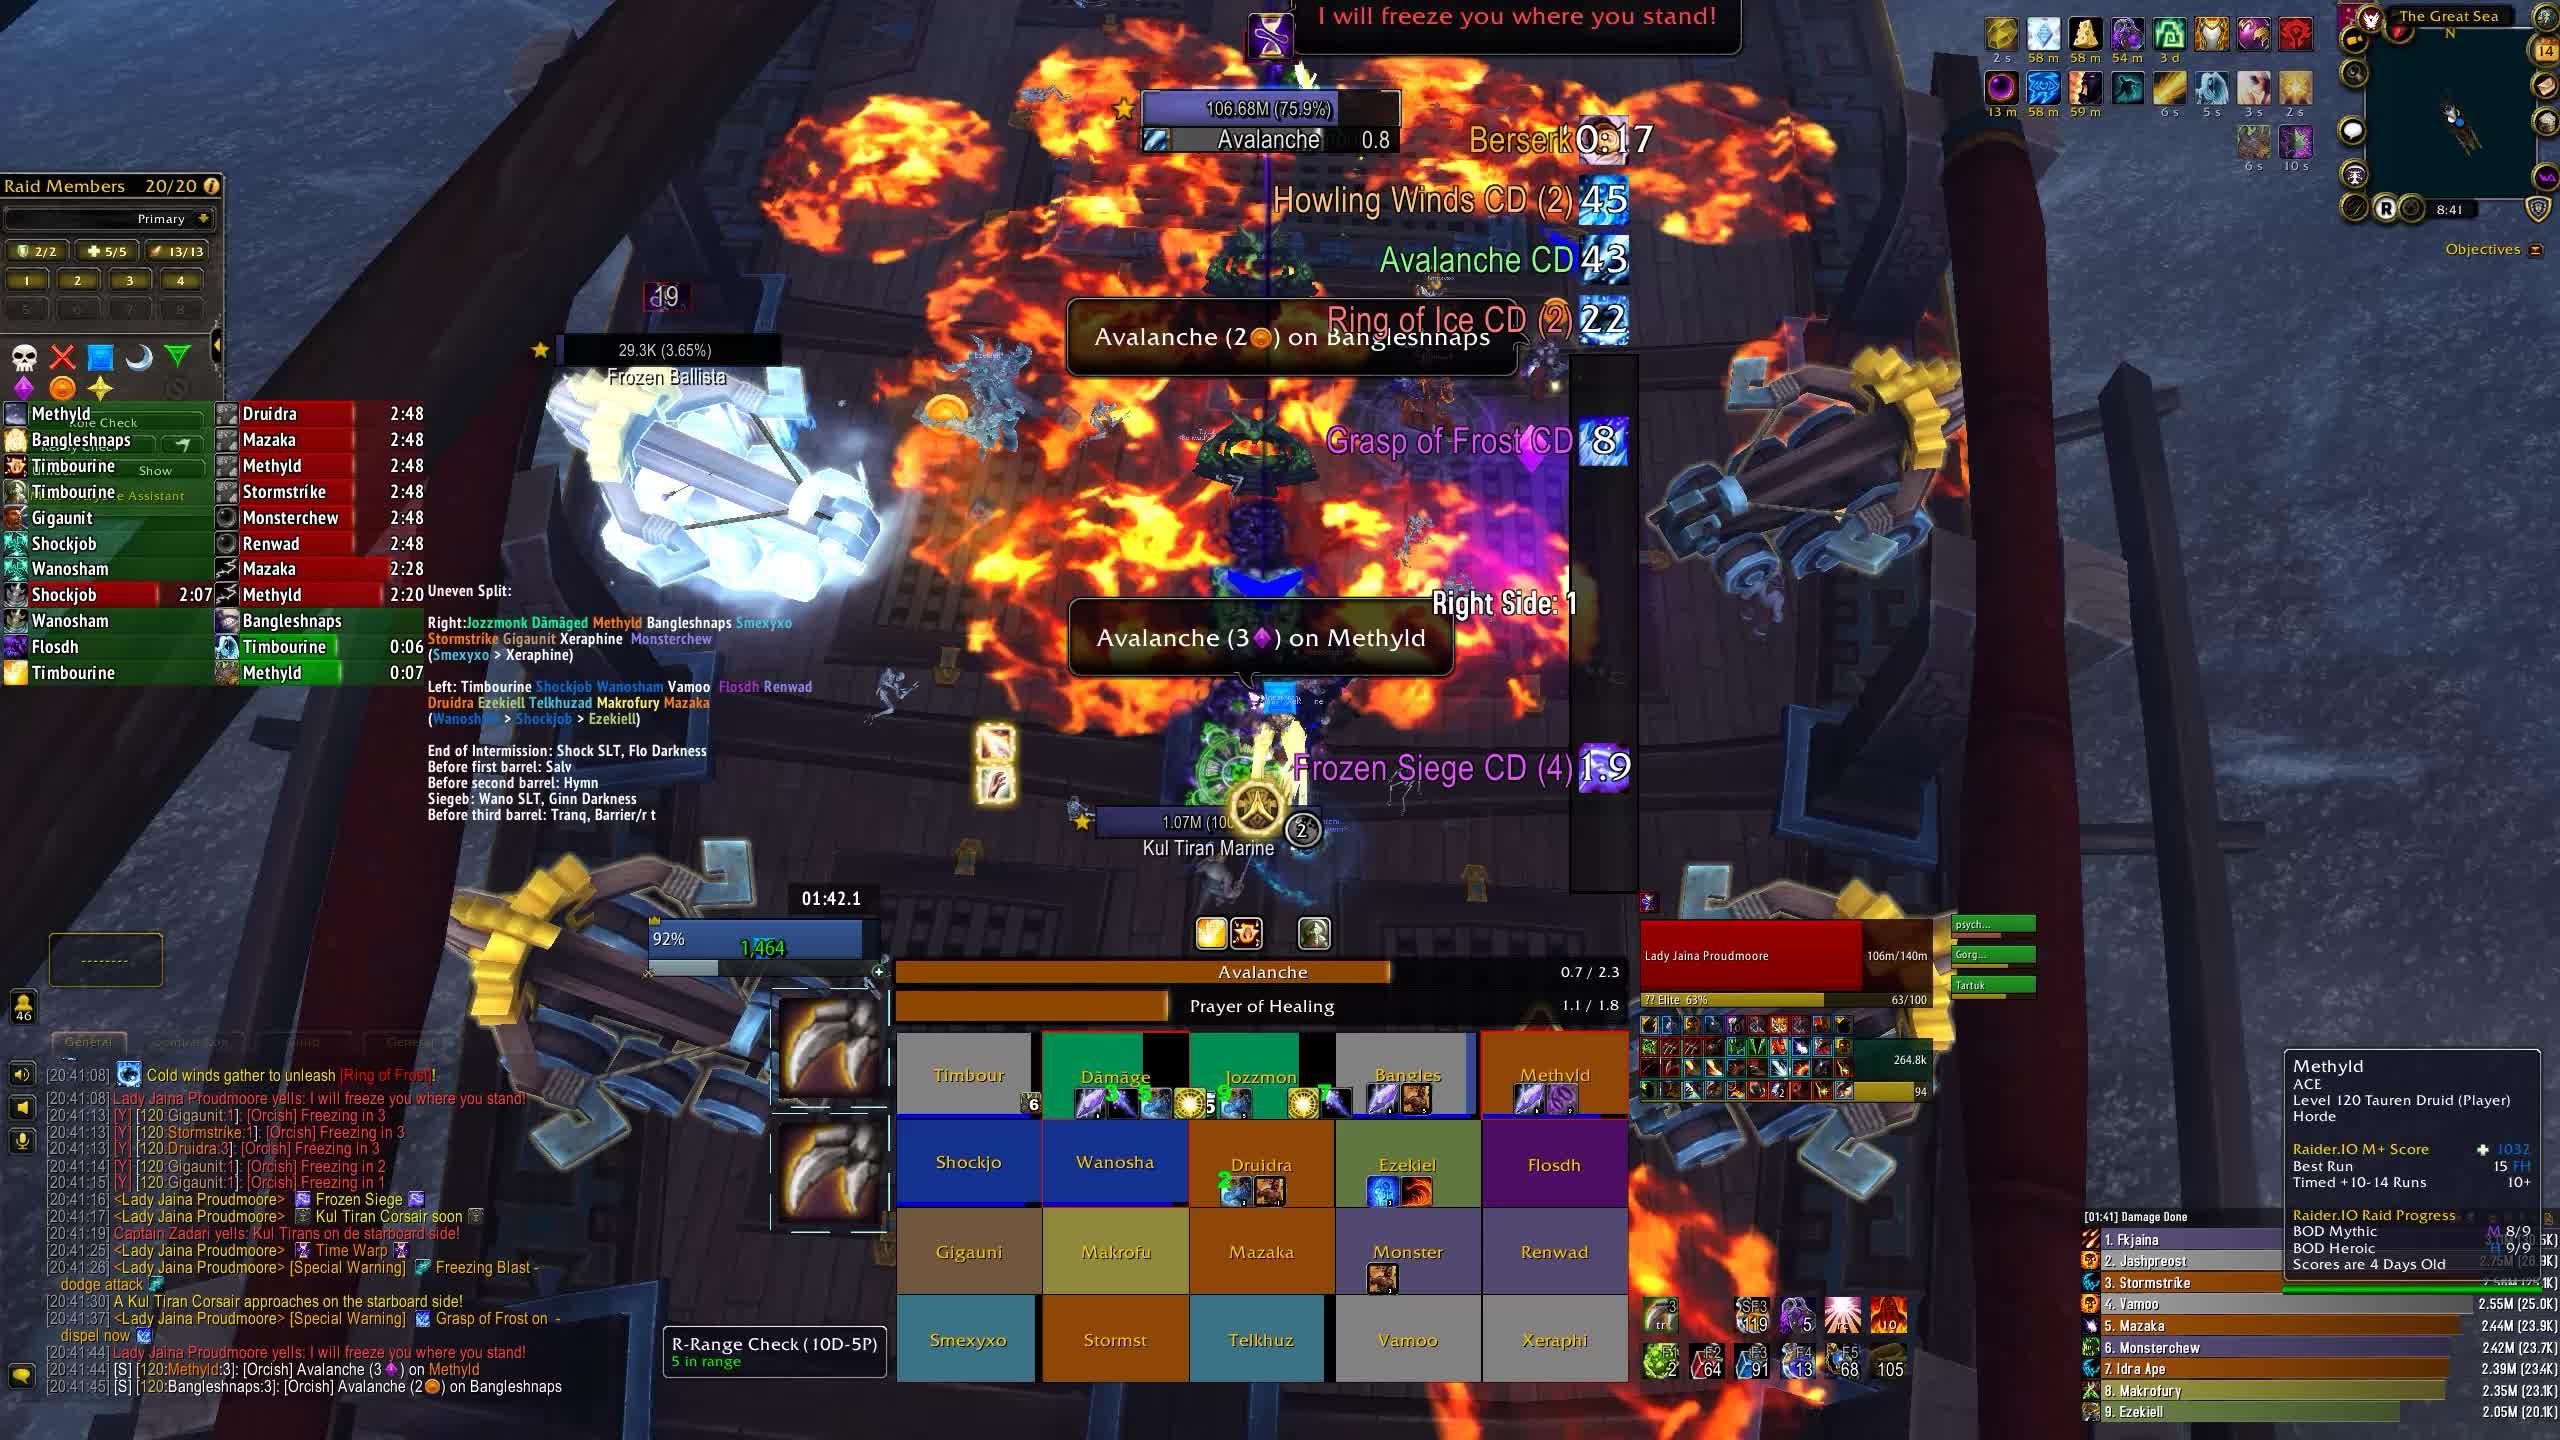 worldofwarcraft, vlc-record-2019-04-14-20h44m08s-World Of Warcraft 2019.04.14 - 20.42.17.04.DVR.mp4- GIFs